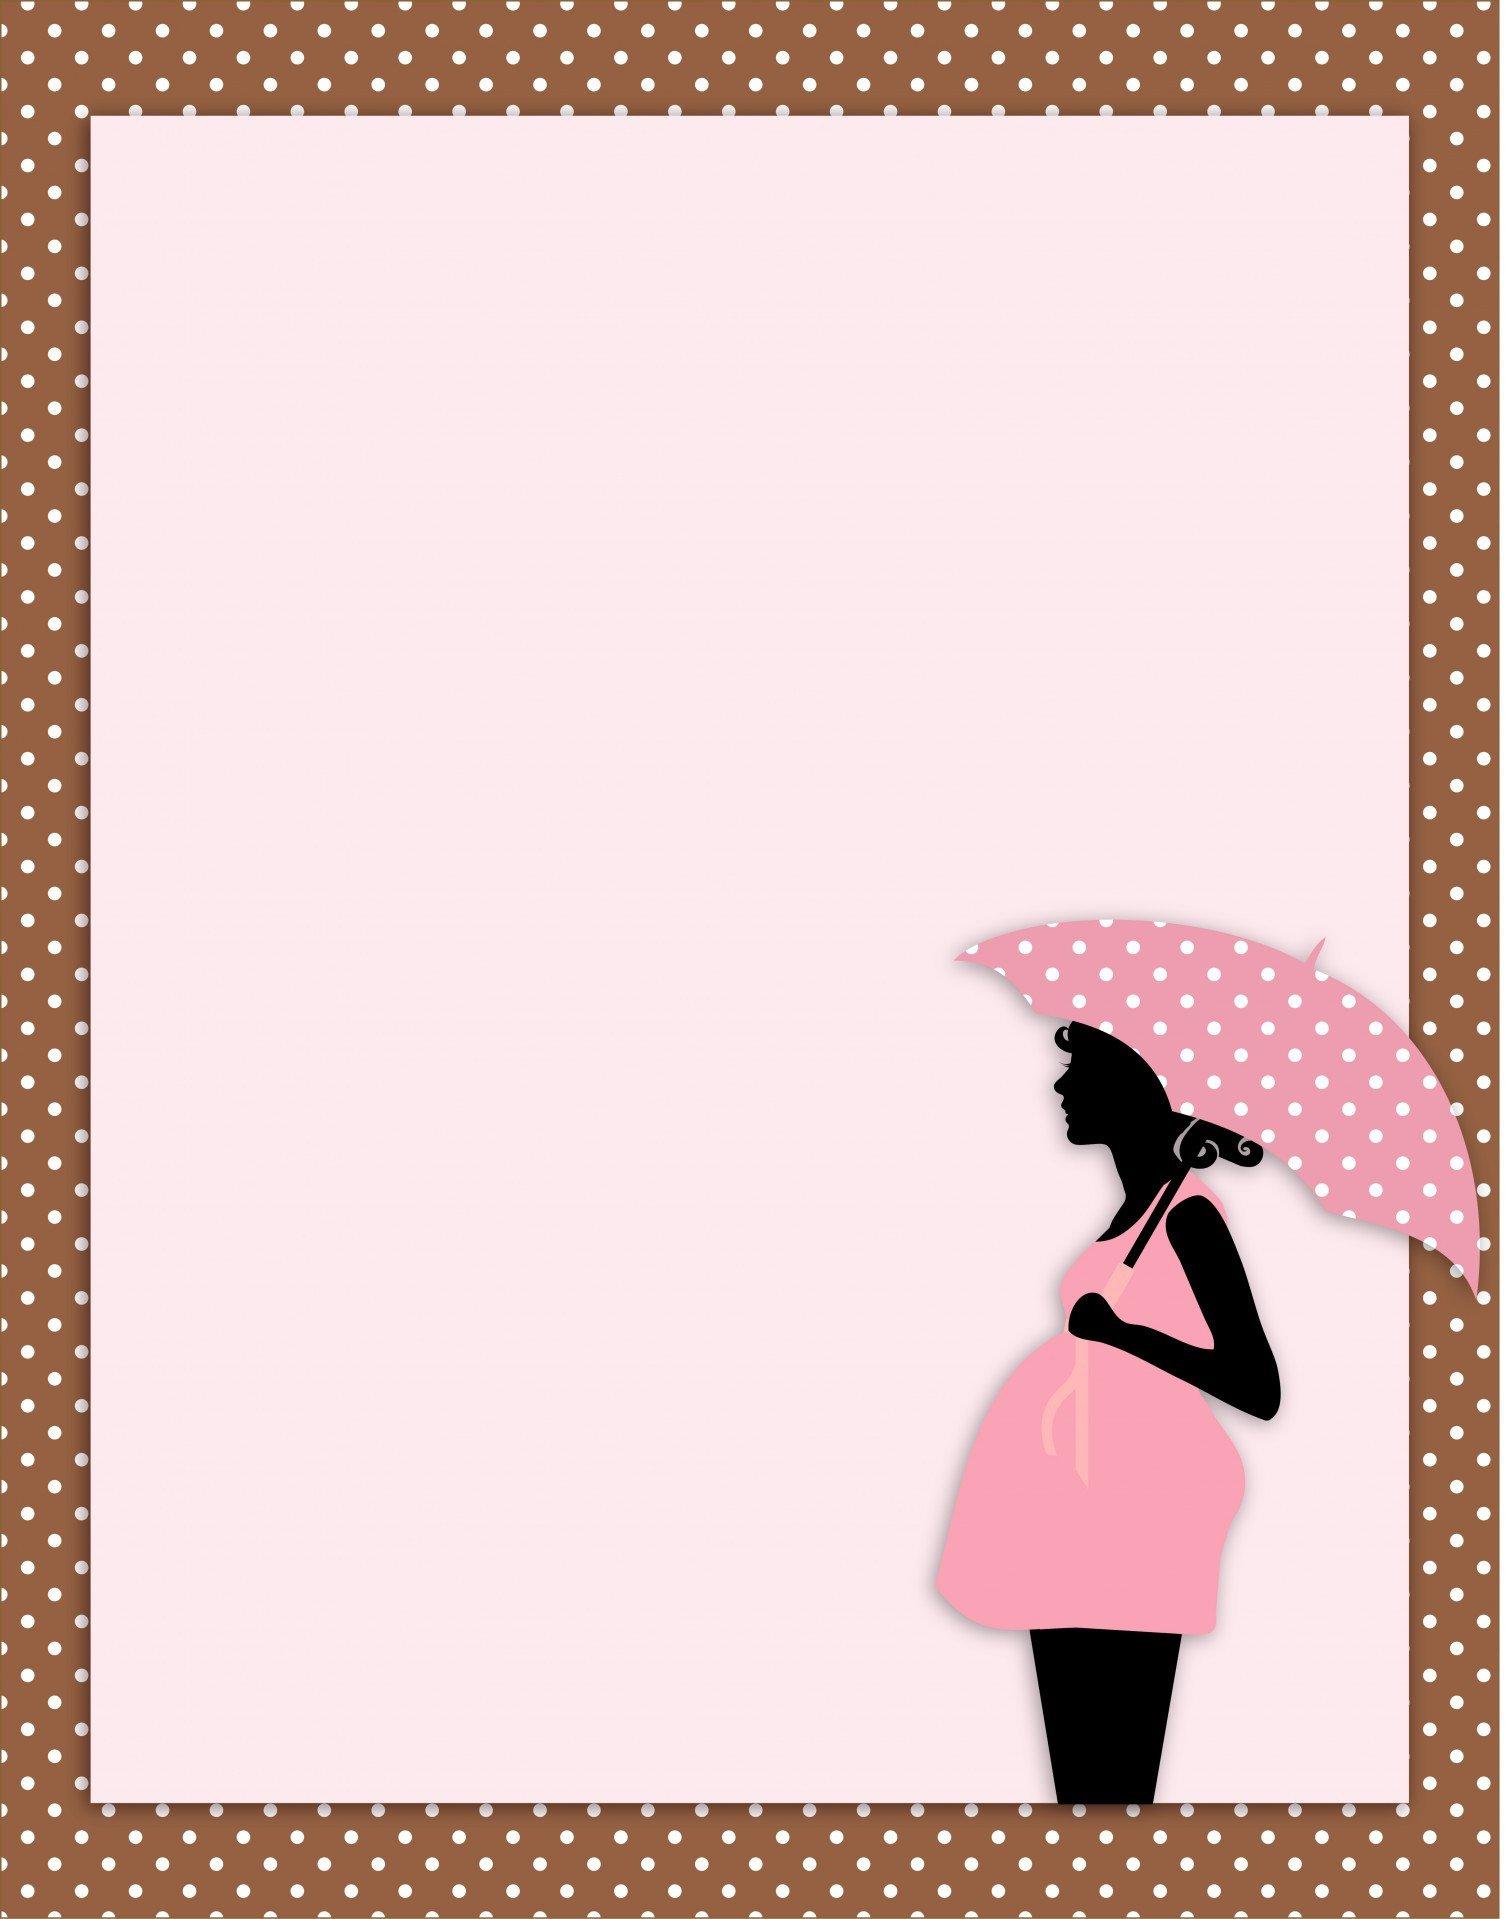 Baby Shower Card Template Baby Shower Card Template Free Stock Public Domain